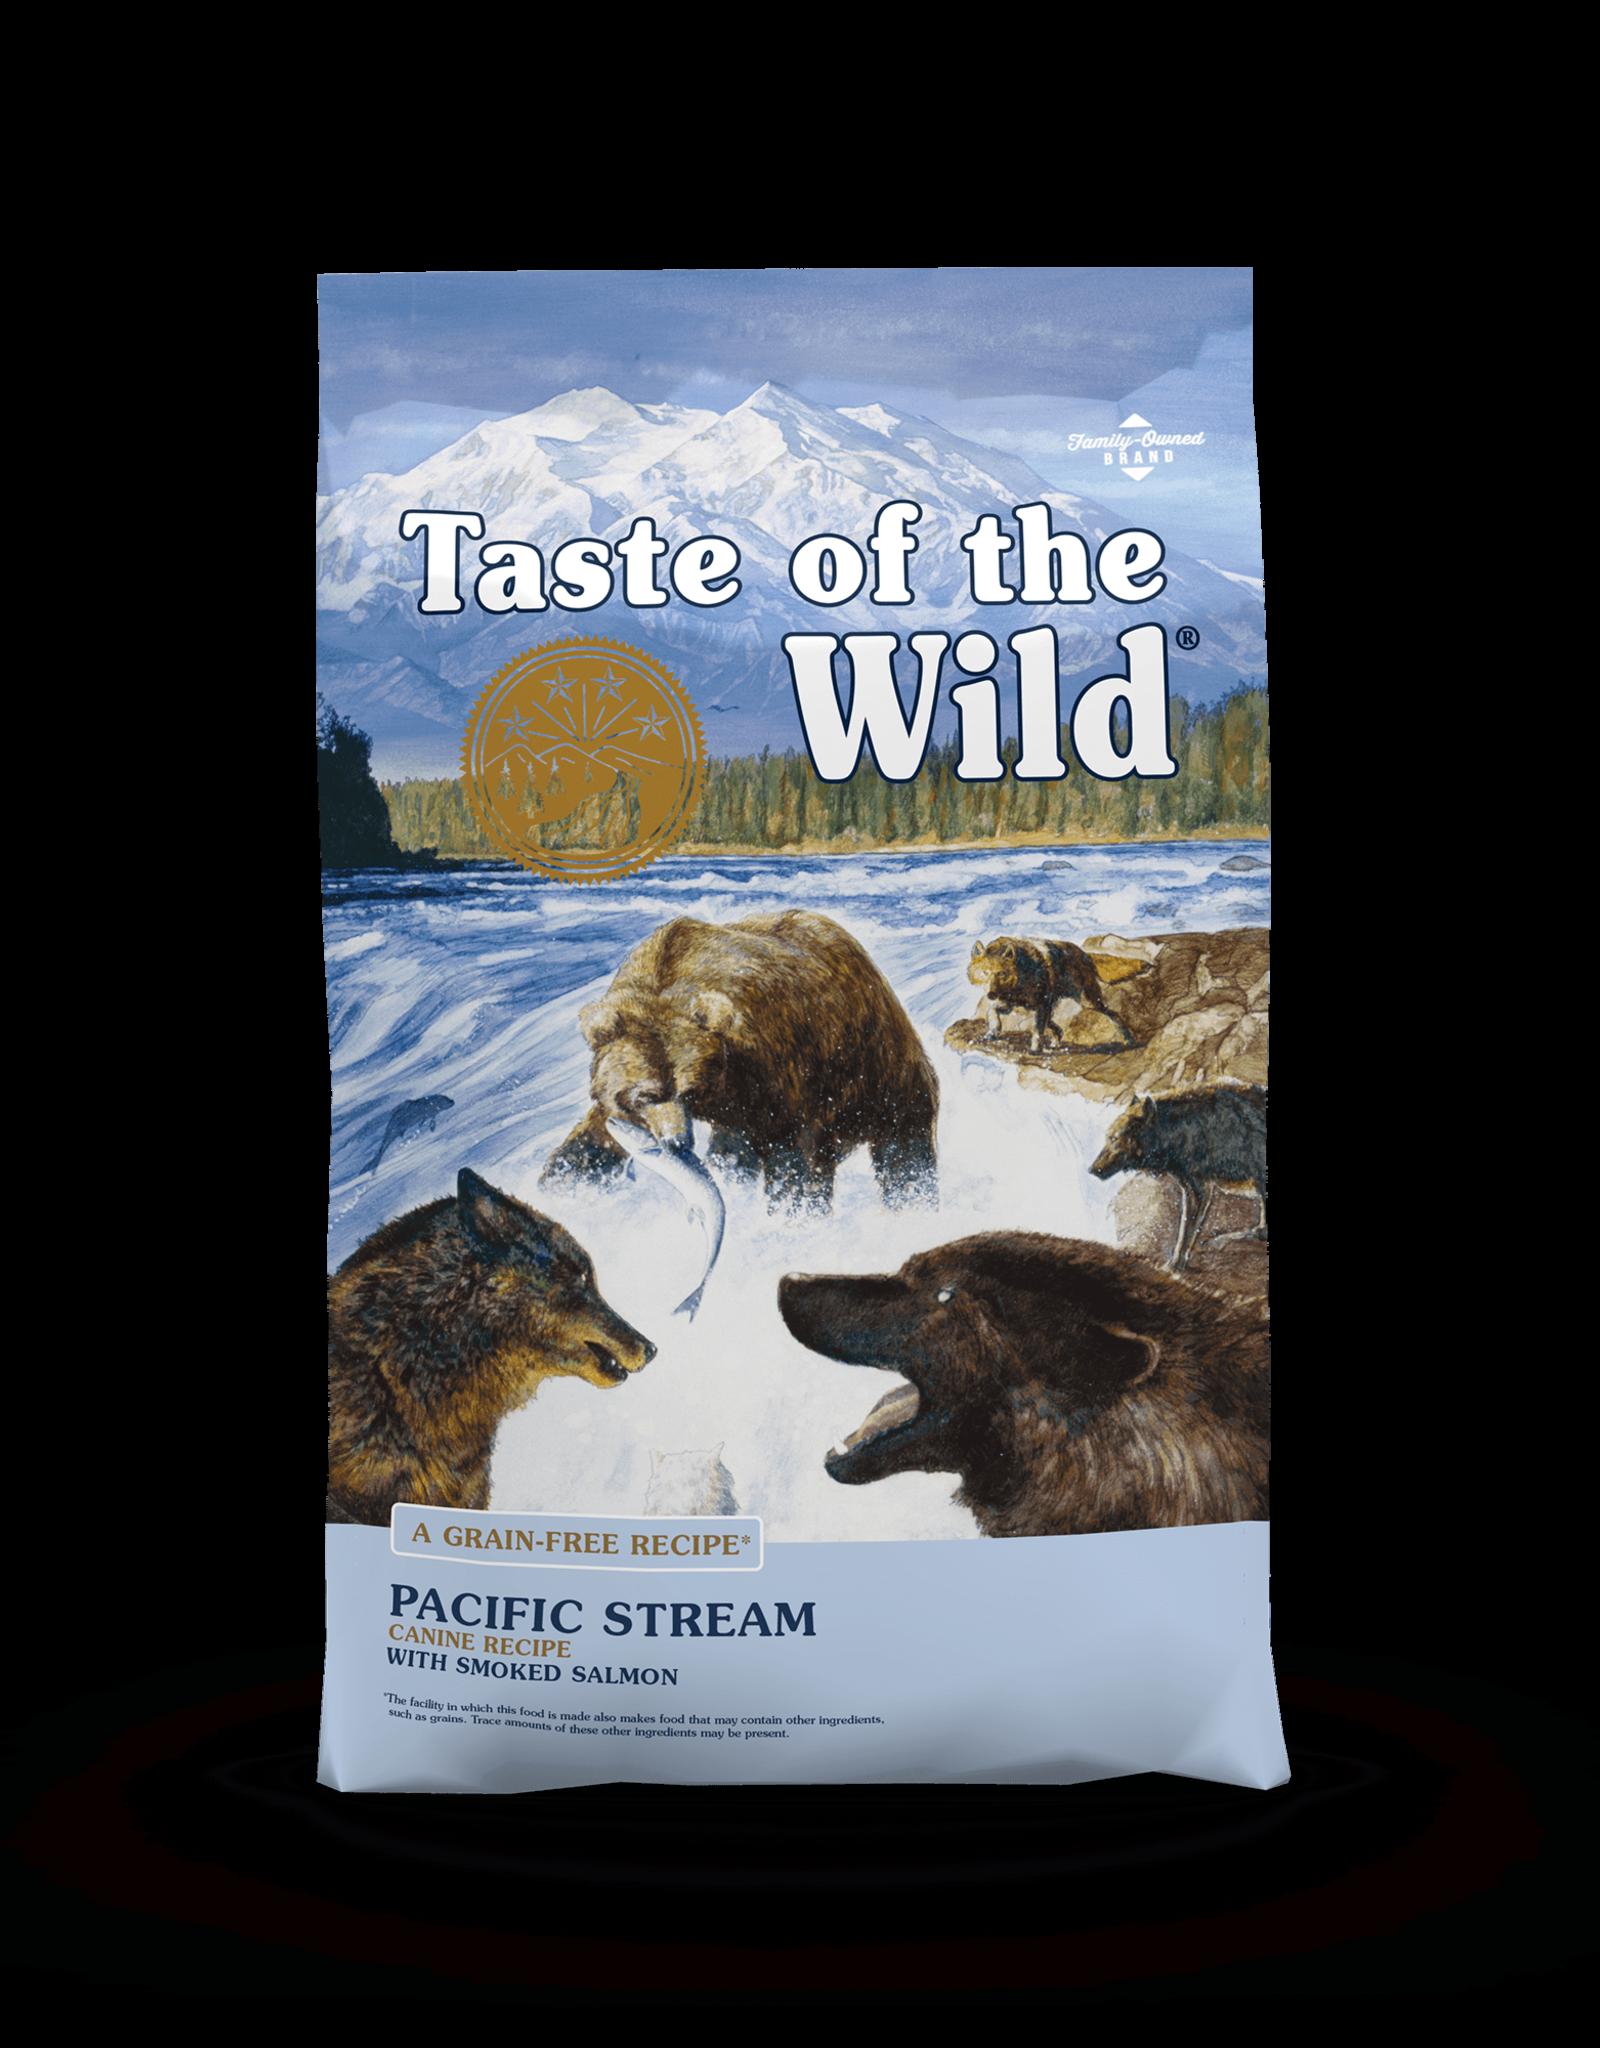 Taste of the Wild Pet Food Dog Pacific Stream Recipe - Grain-Free 14lb